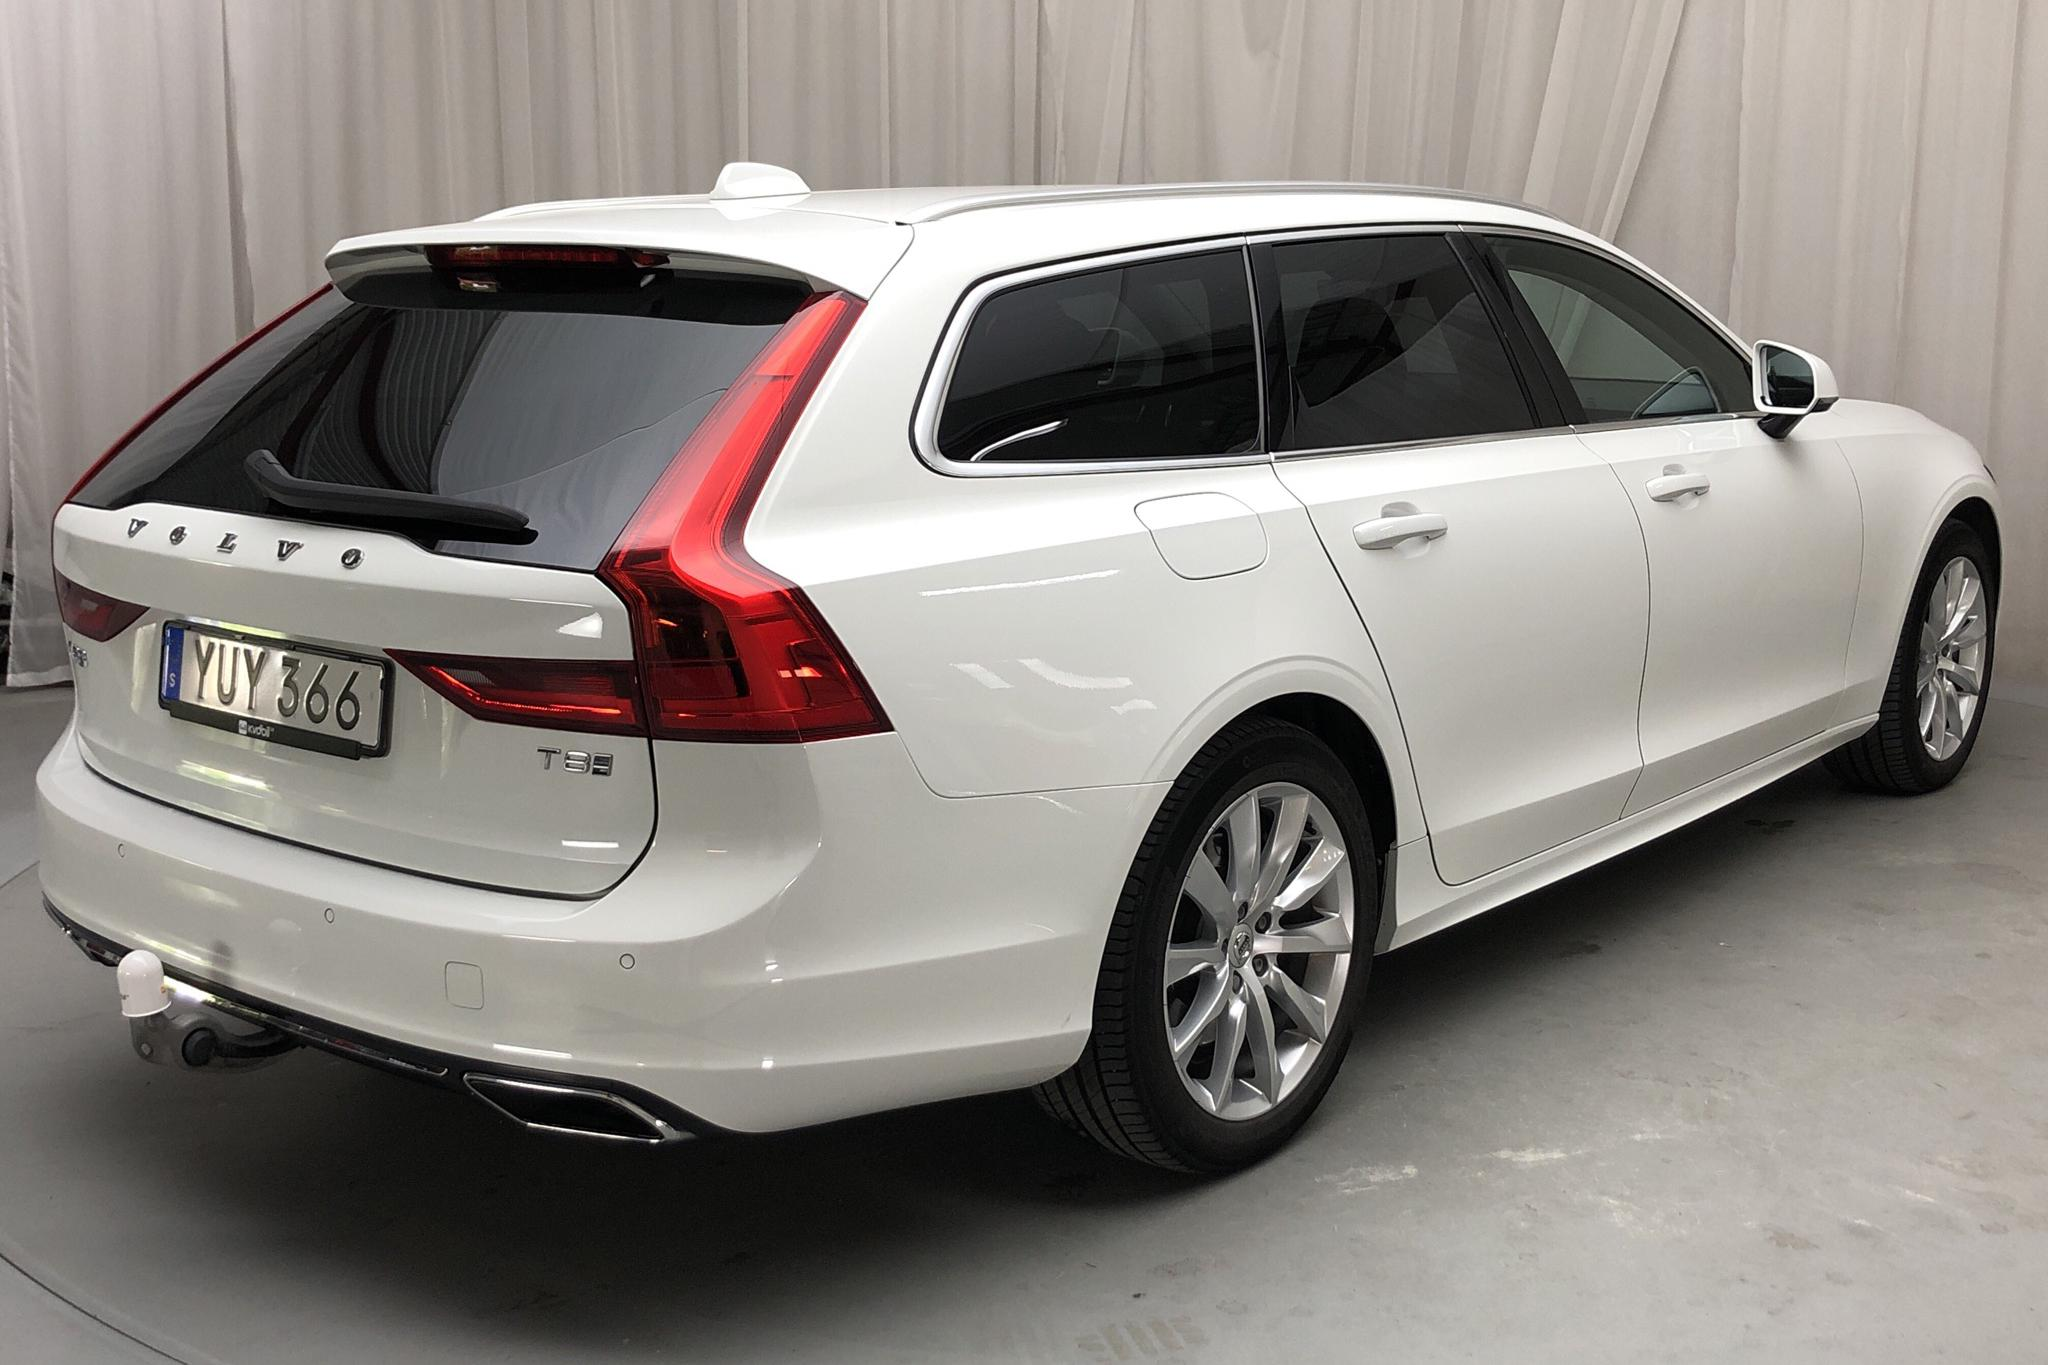 Volvo V90 T8 AWD Twin Engine (390hk) - 75 700 km - Automatic - white - 2019